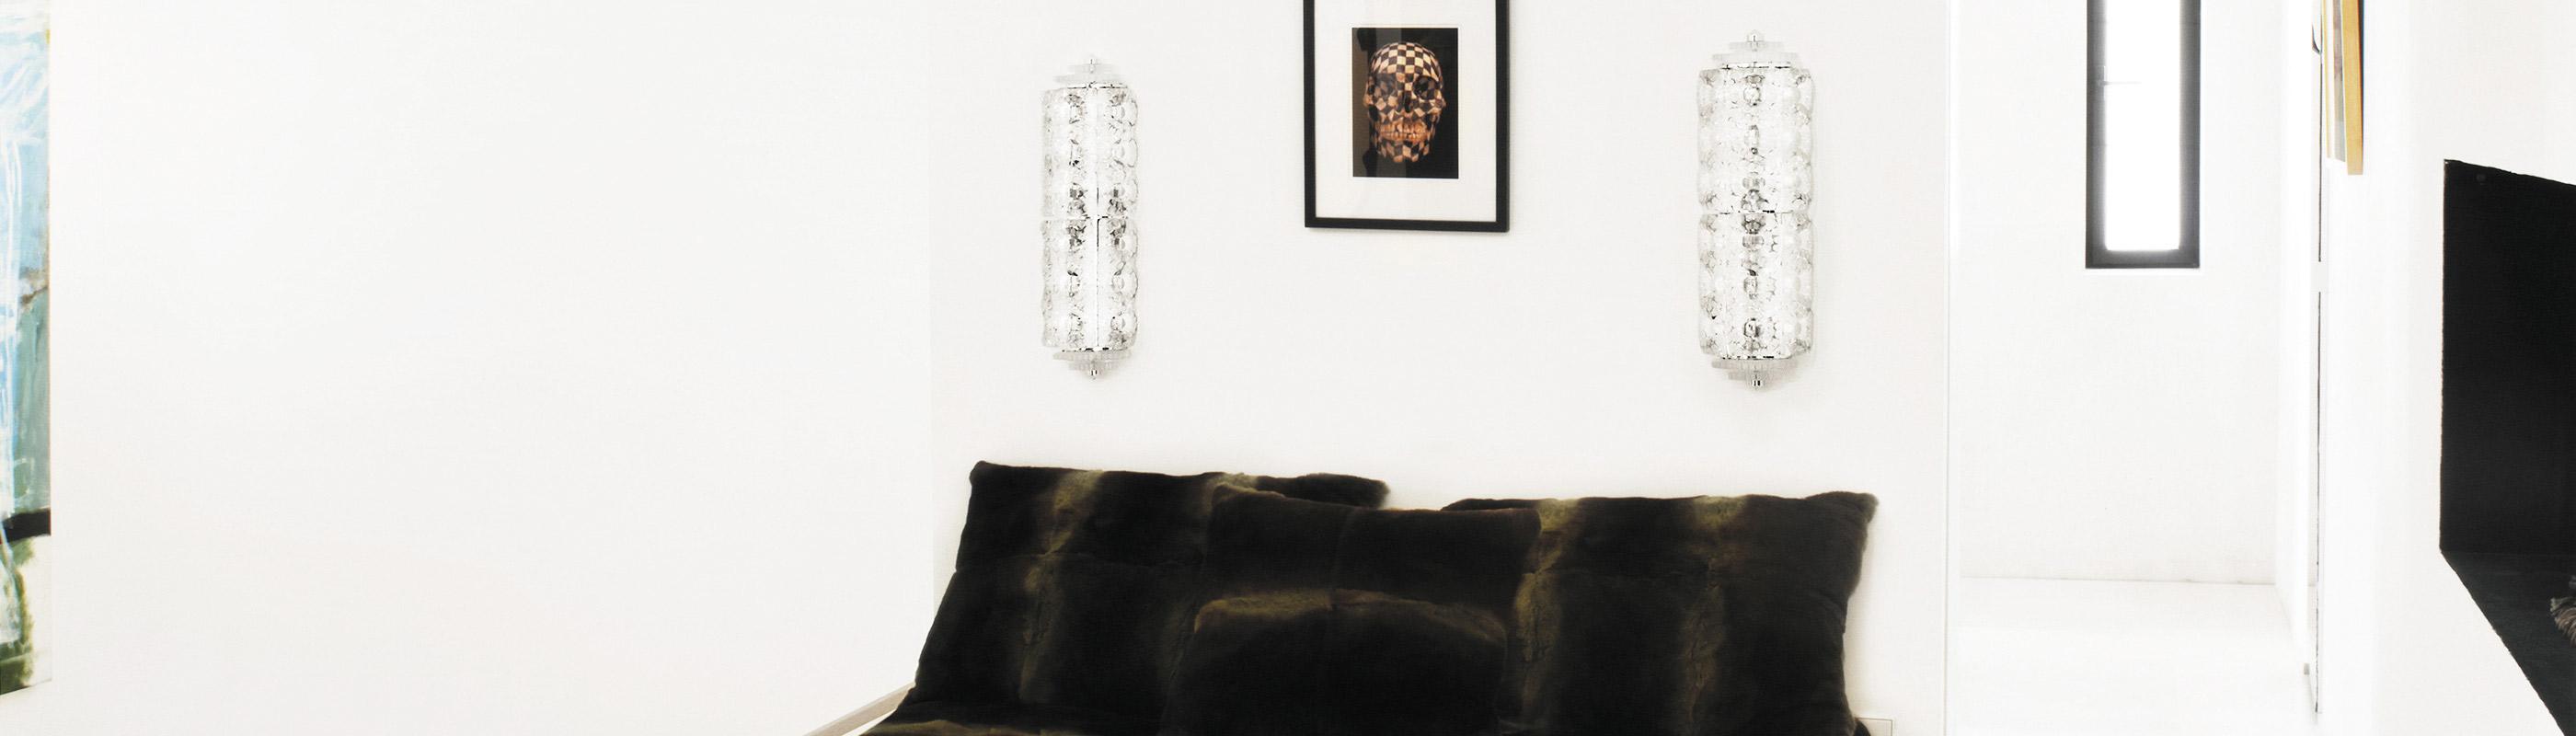 sconces wall lighting. Wall Lamps 15 Items Sconces Lighting O